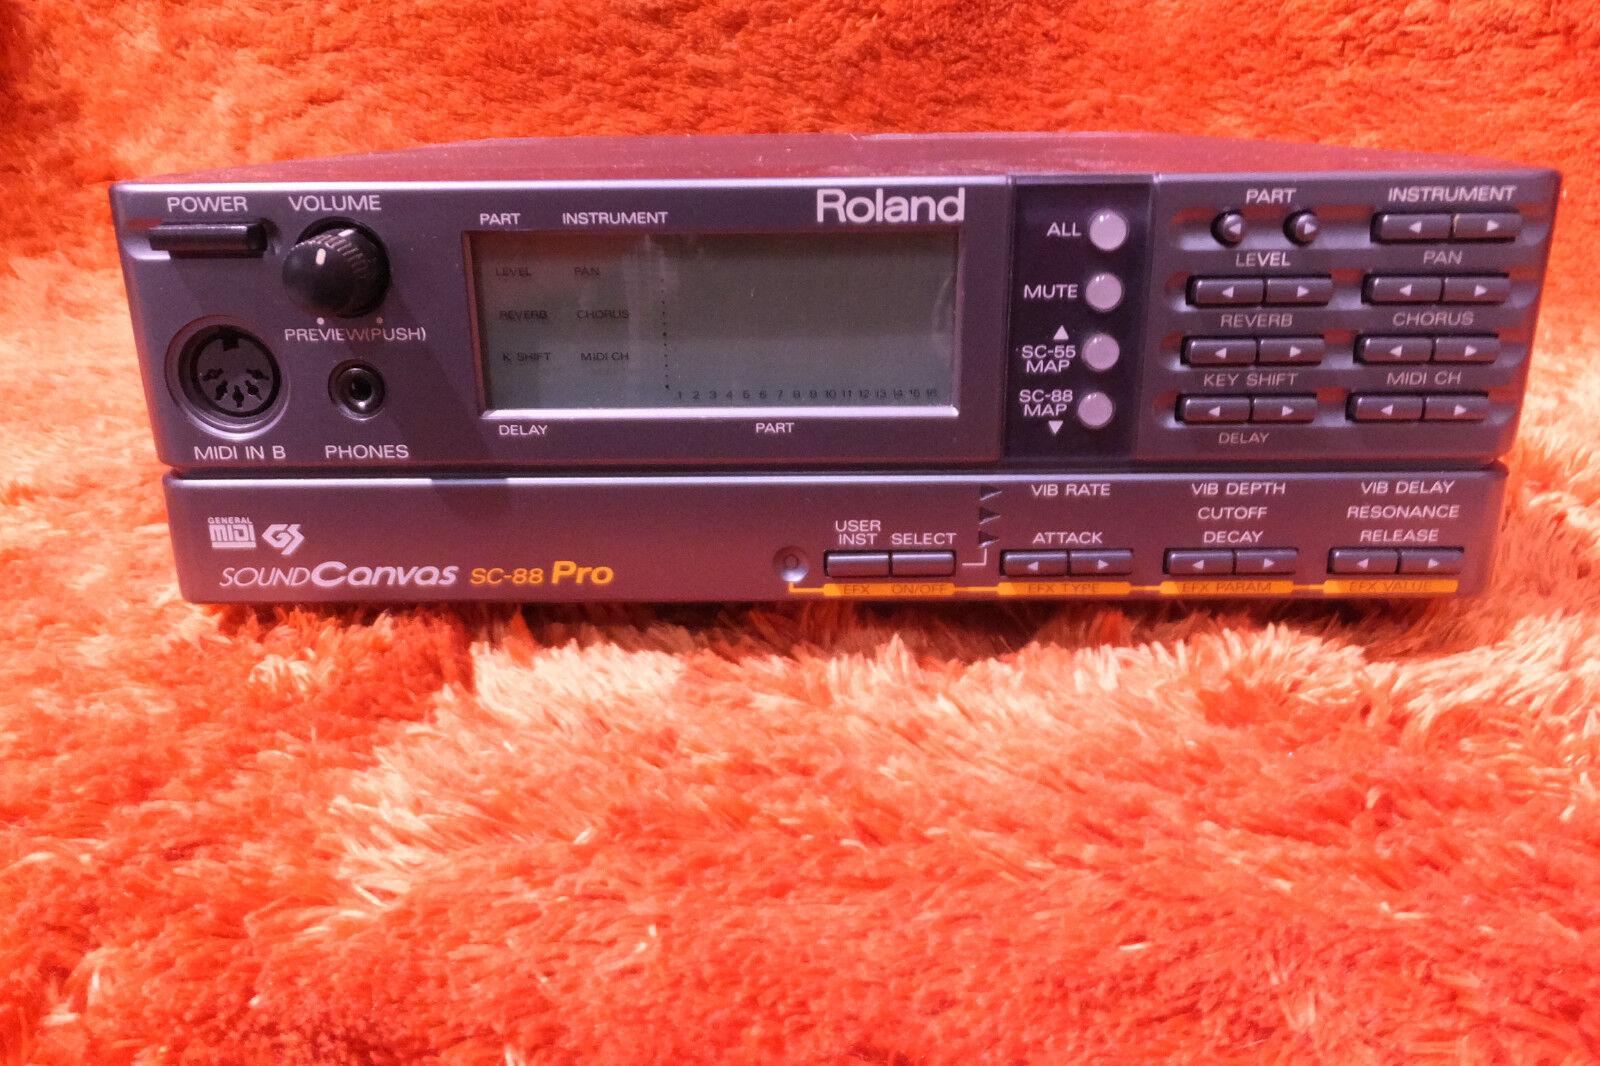 Roland Roland Roland SC-88 Pro sc88pro Módulo de lona de sonido synth AJ73213 180326  comprar barato